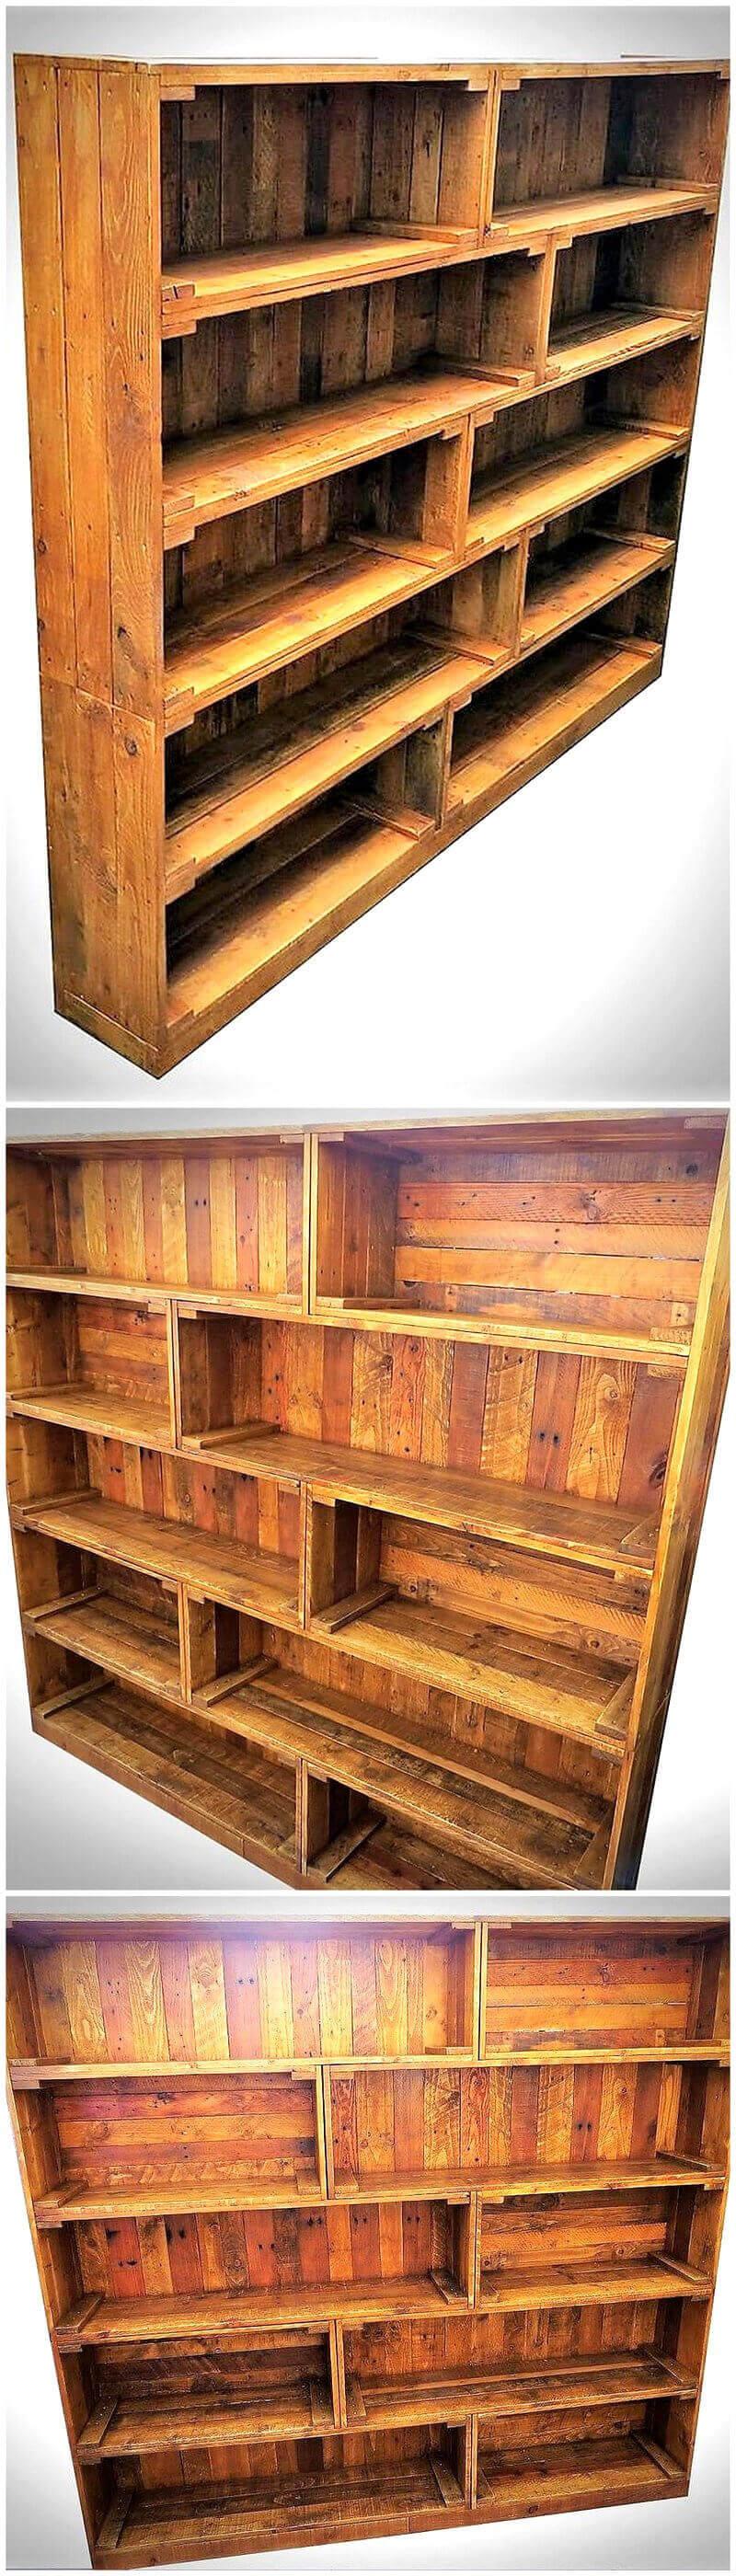 wooden pallet shelving cabinet 21